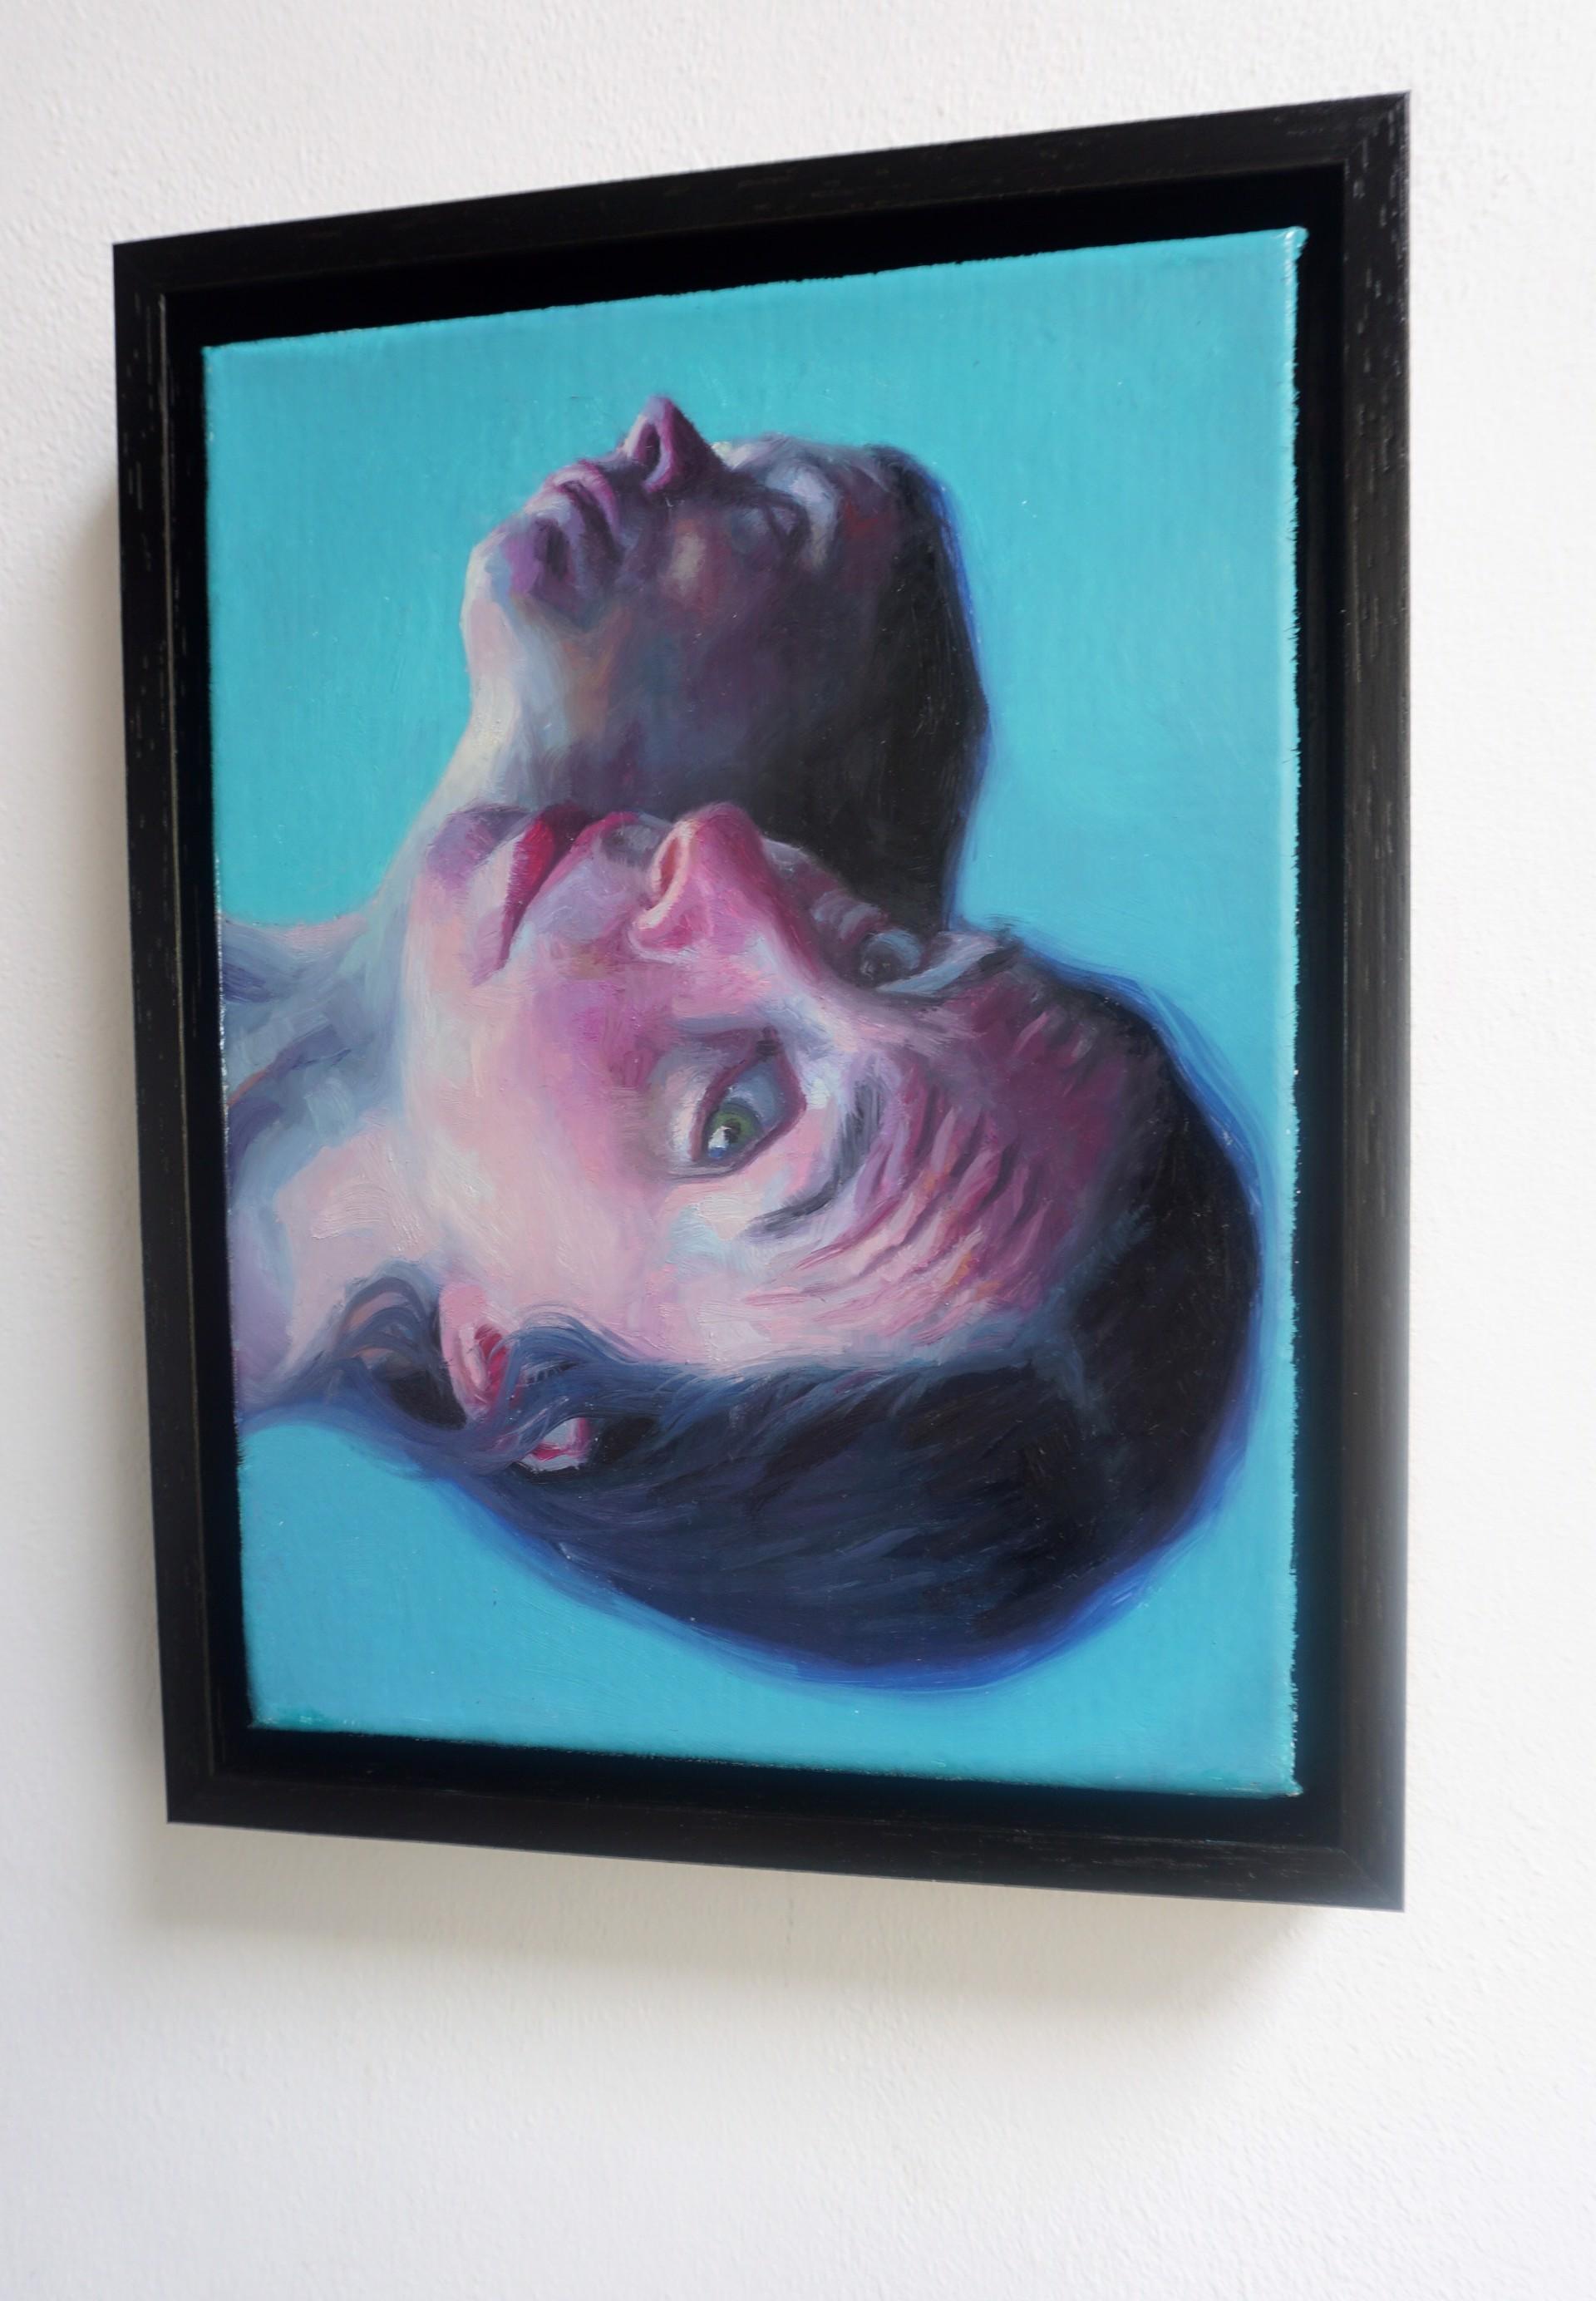 Falling Apart by Francien Krieg